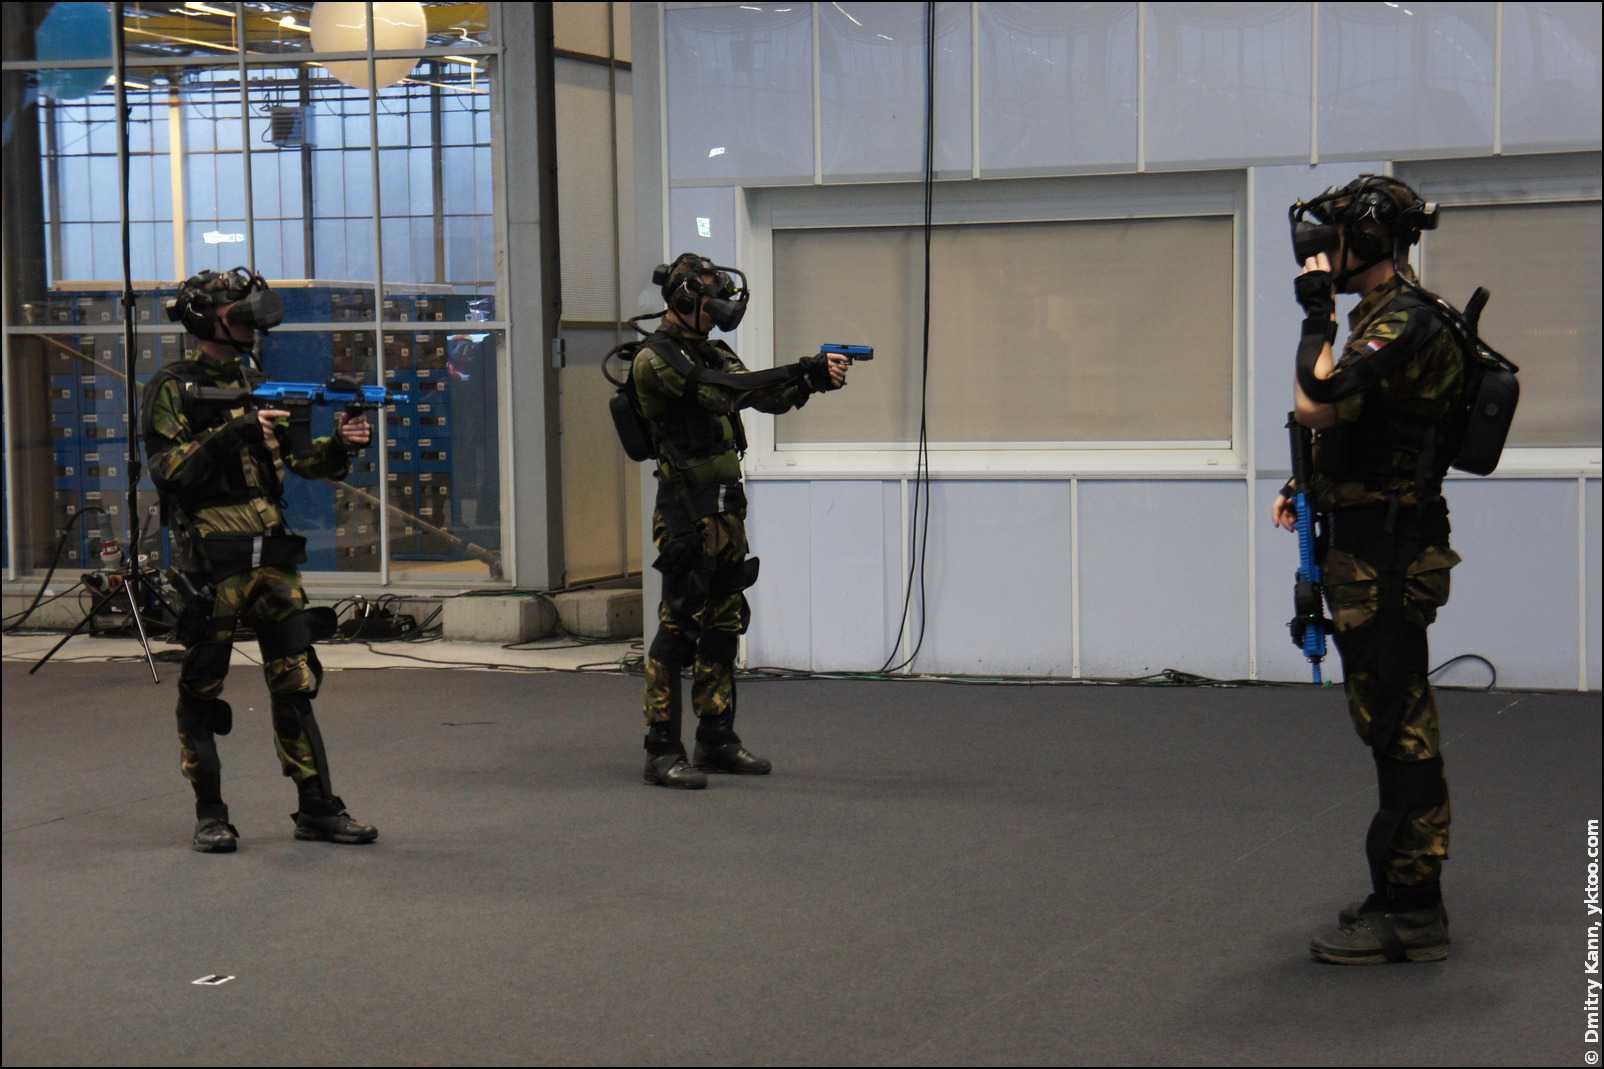 Тактическое задание с SUIT (Small Unit Immersive Trainer).